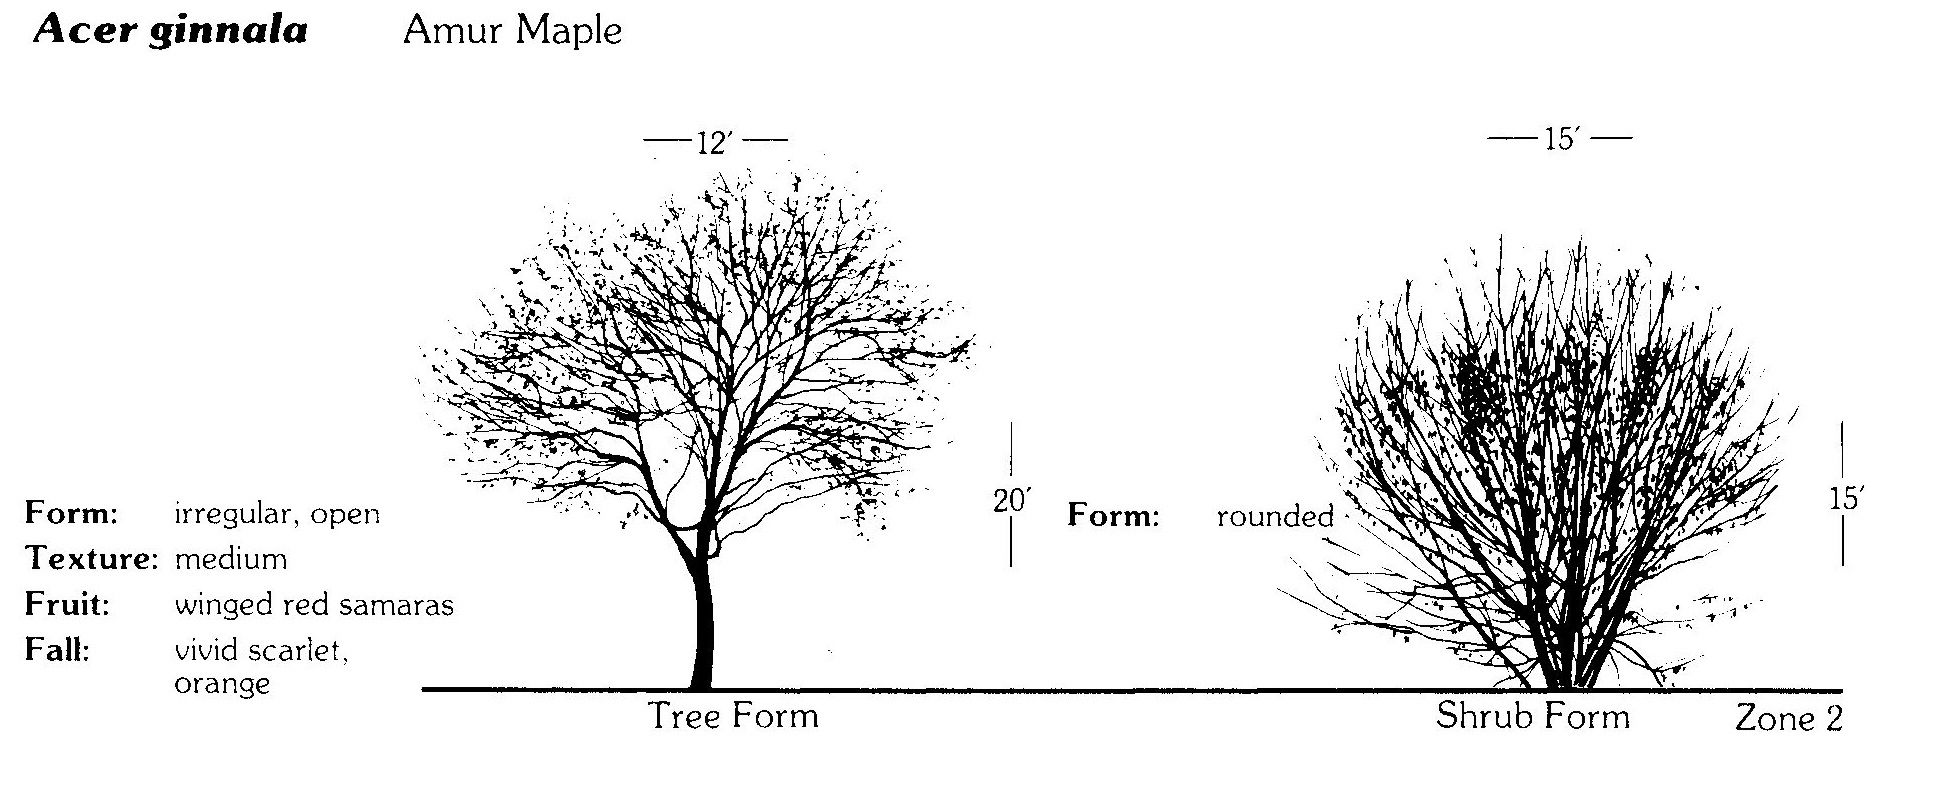 growing amur maple  acer ginnala